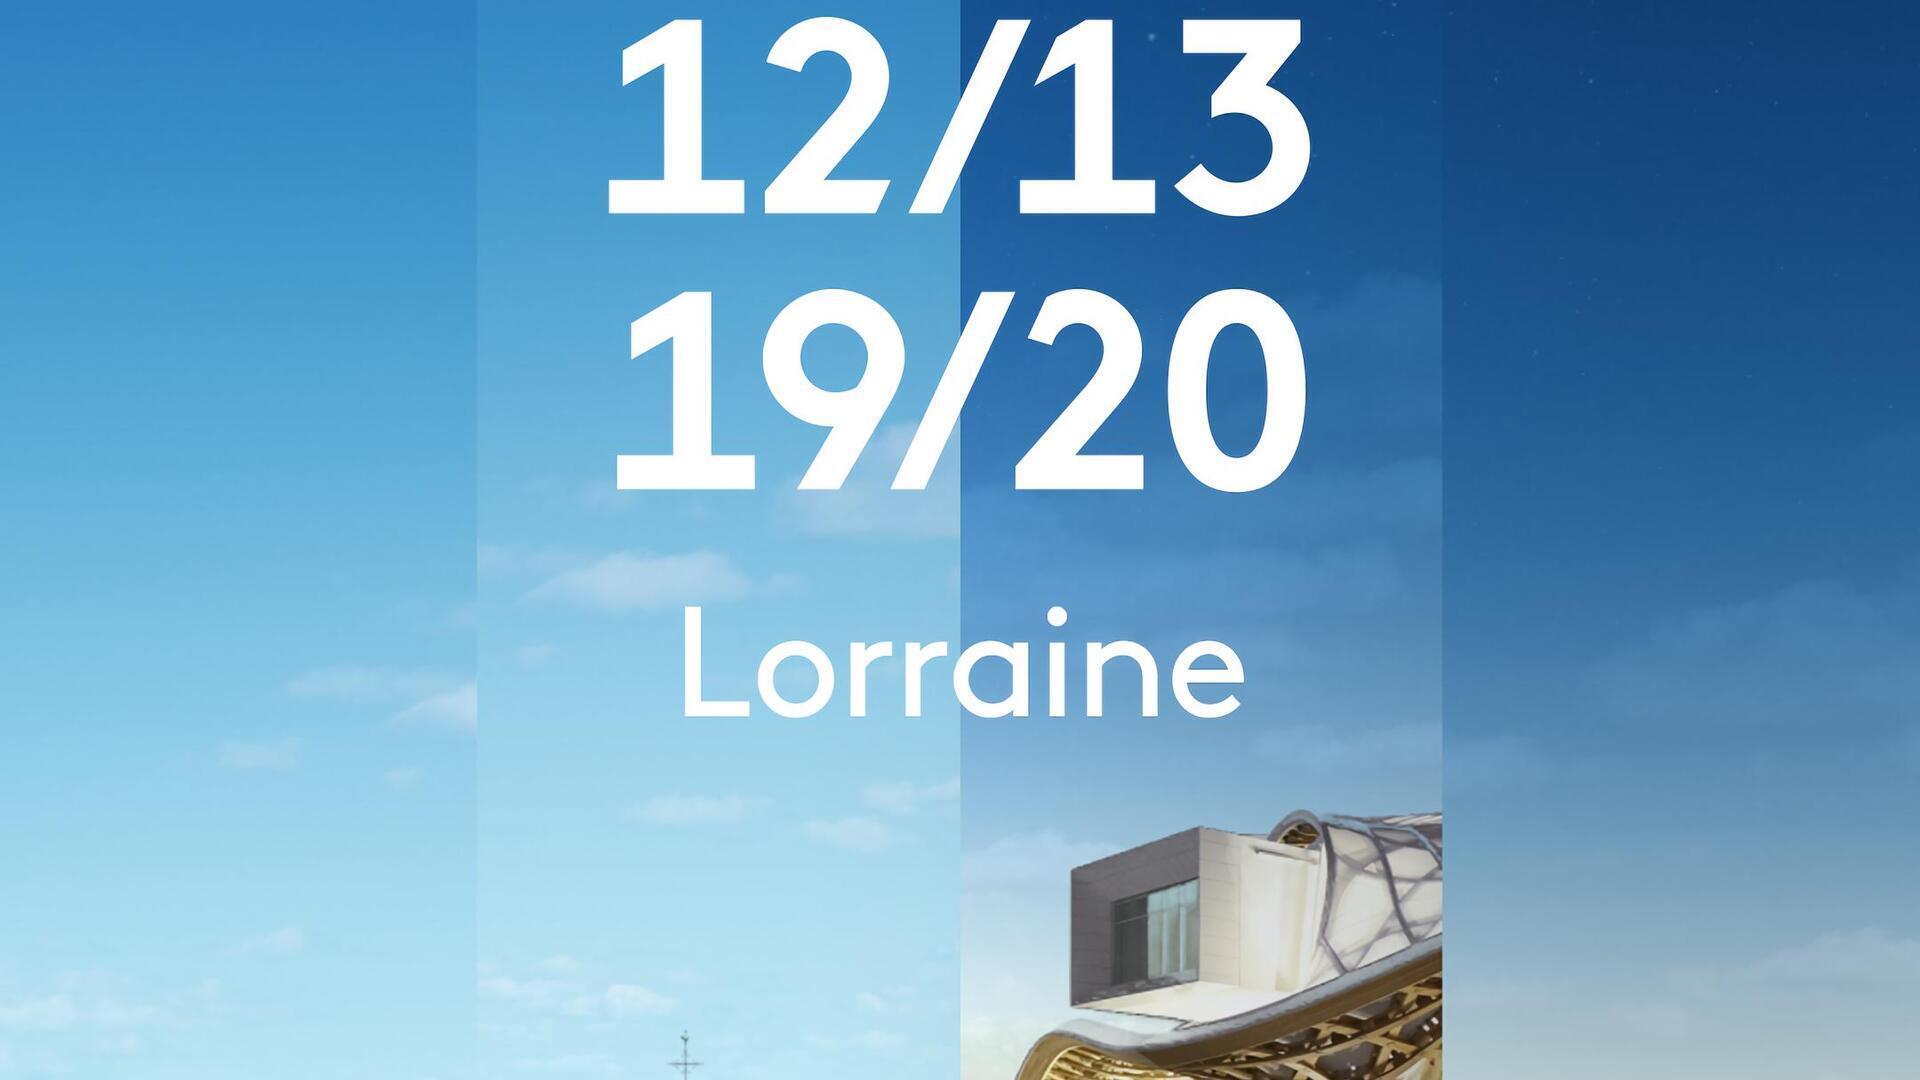 12/13 Lorraine : Edition spéciale Place Stanislas